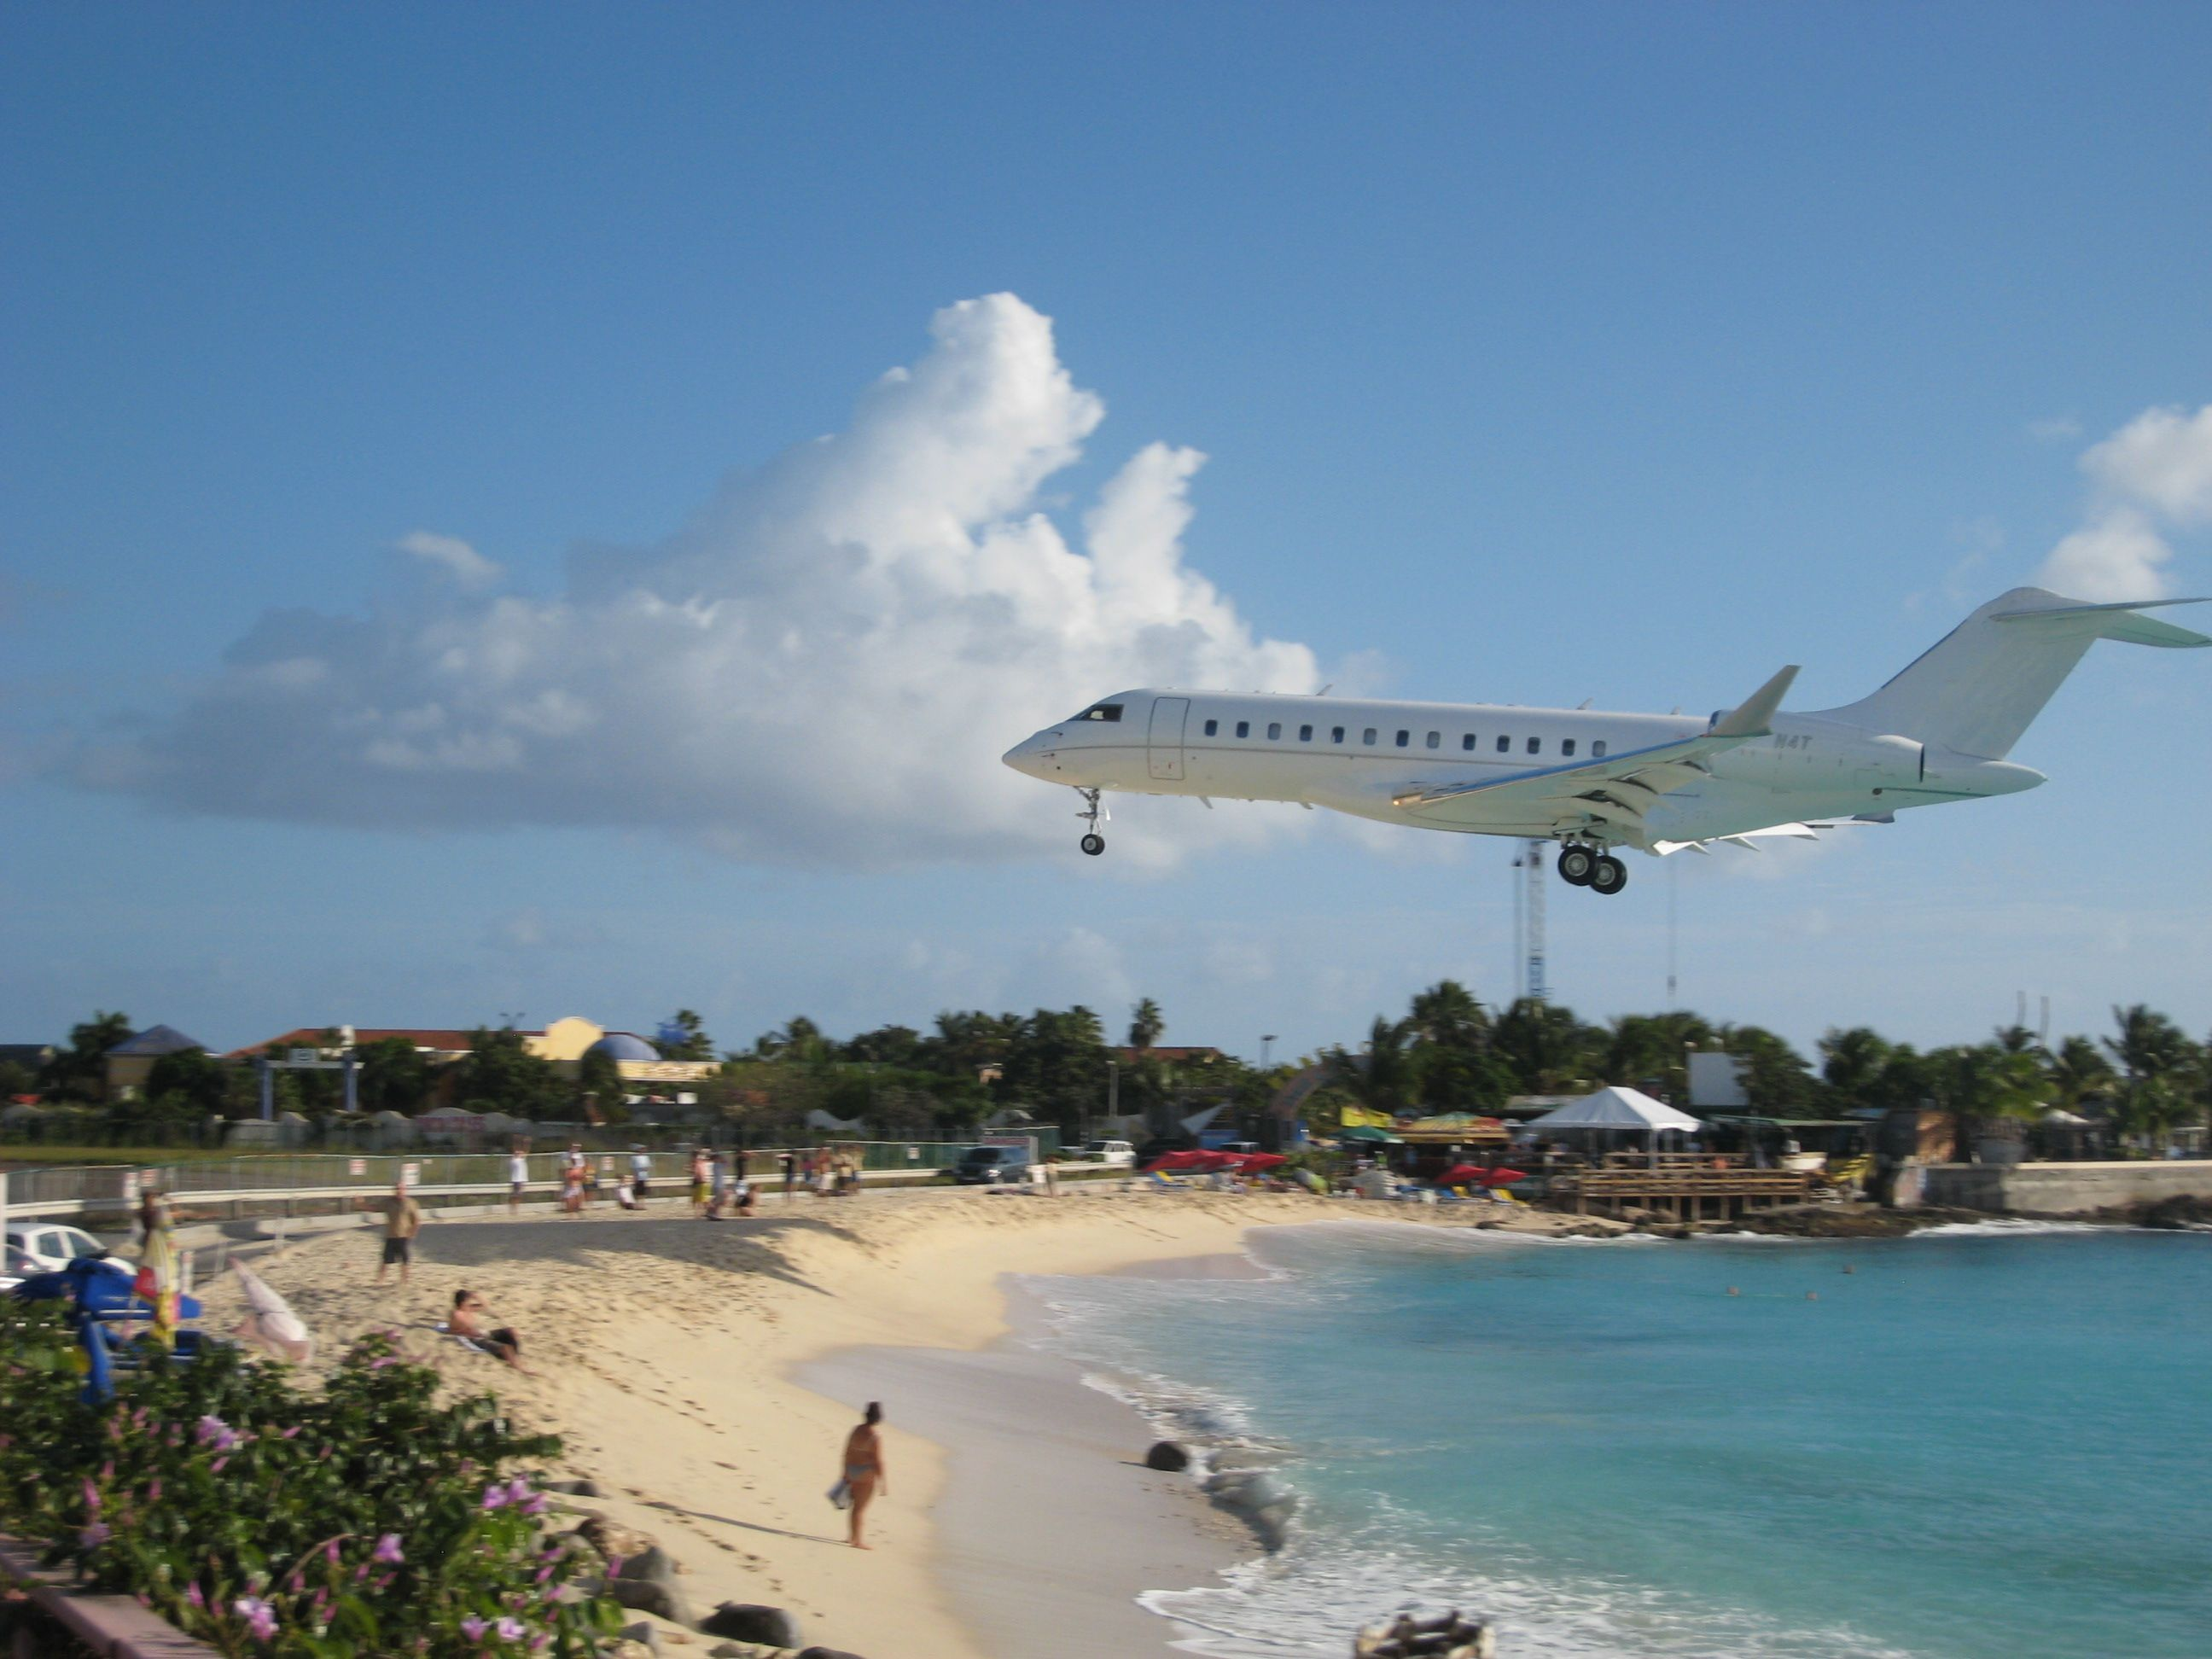 Private Jets Private Jet Charter Flights Business Jet